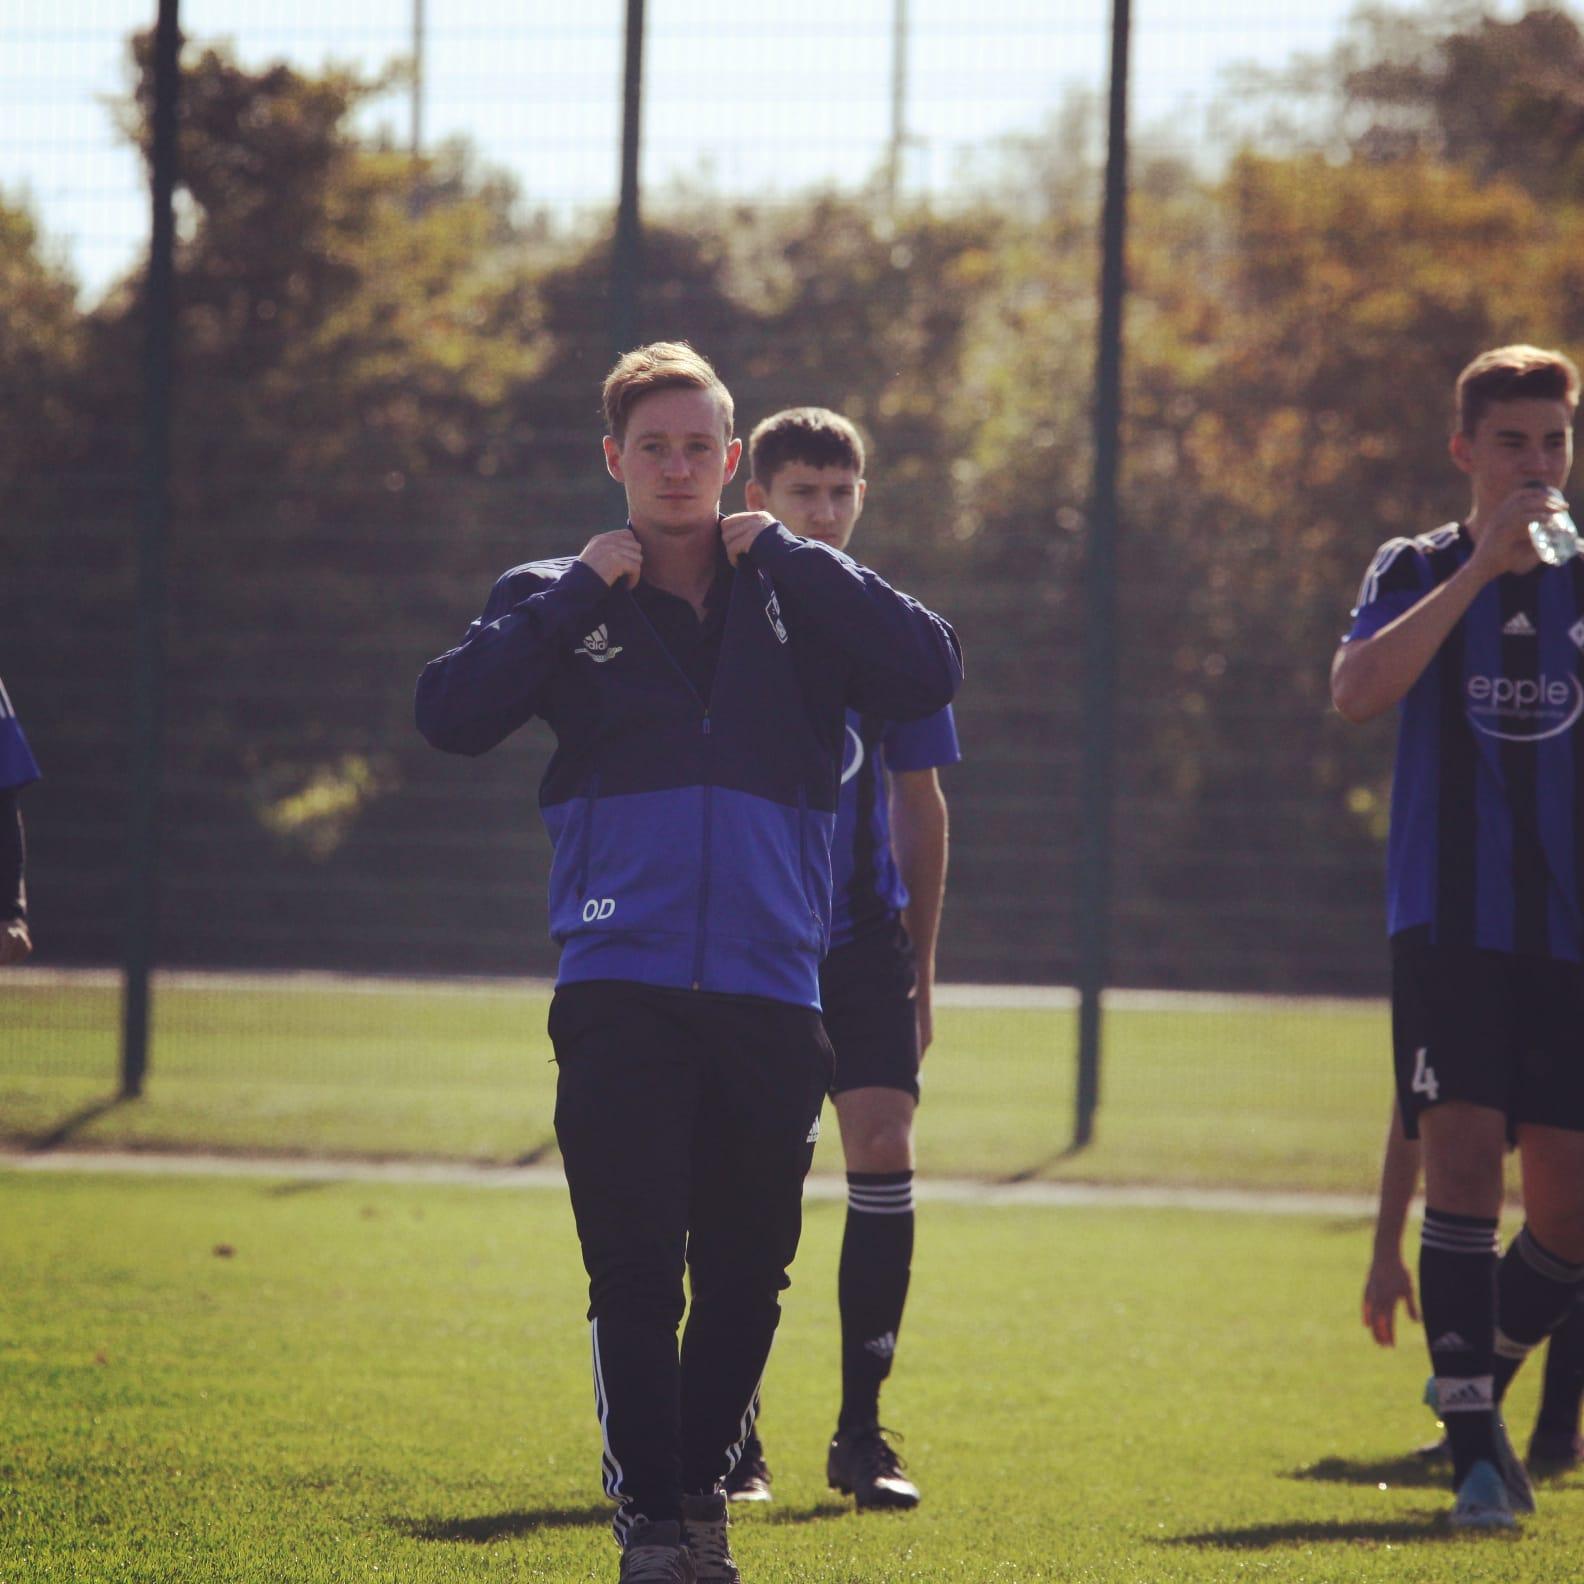 Fussball Individualtraining Ulm Memmingen, Oliver Demmeler, Rising Pro